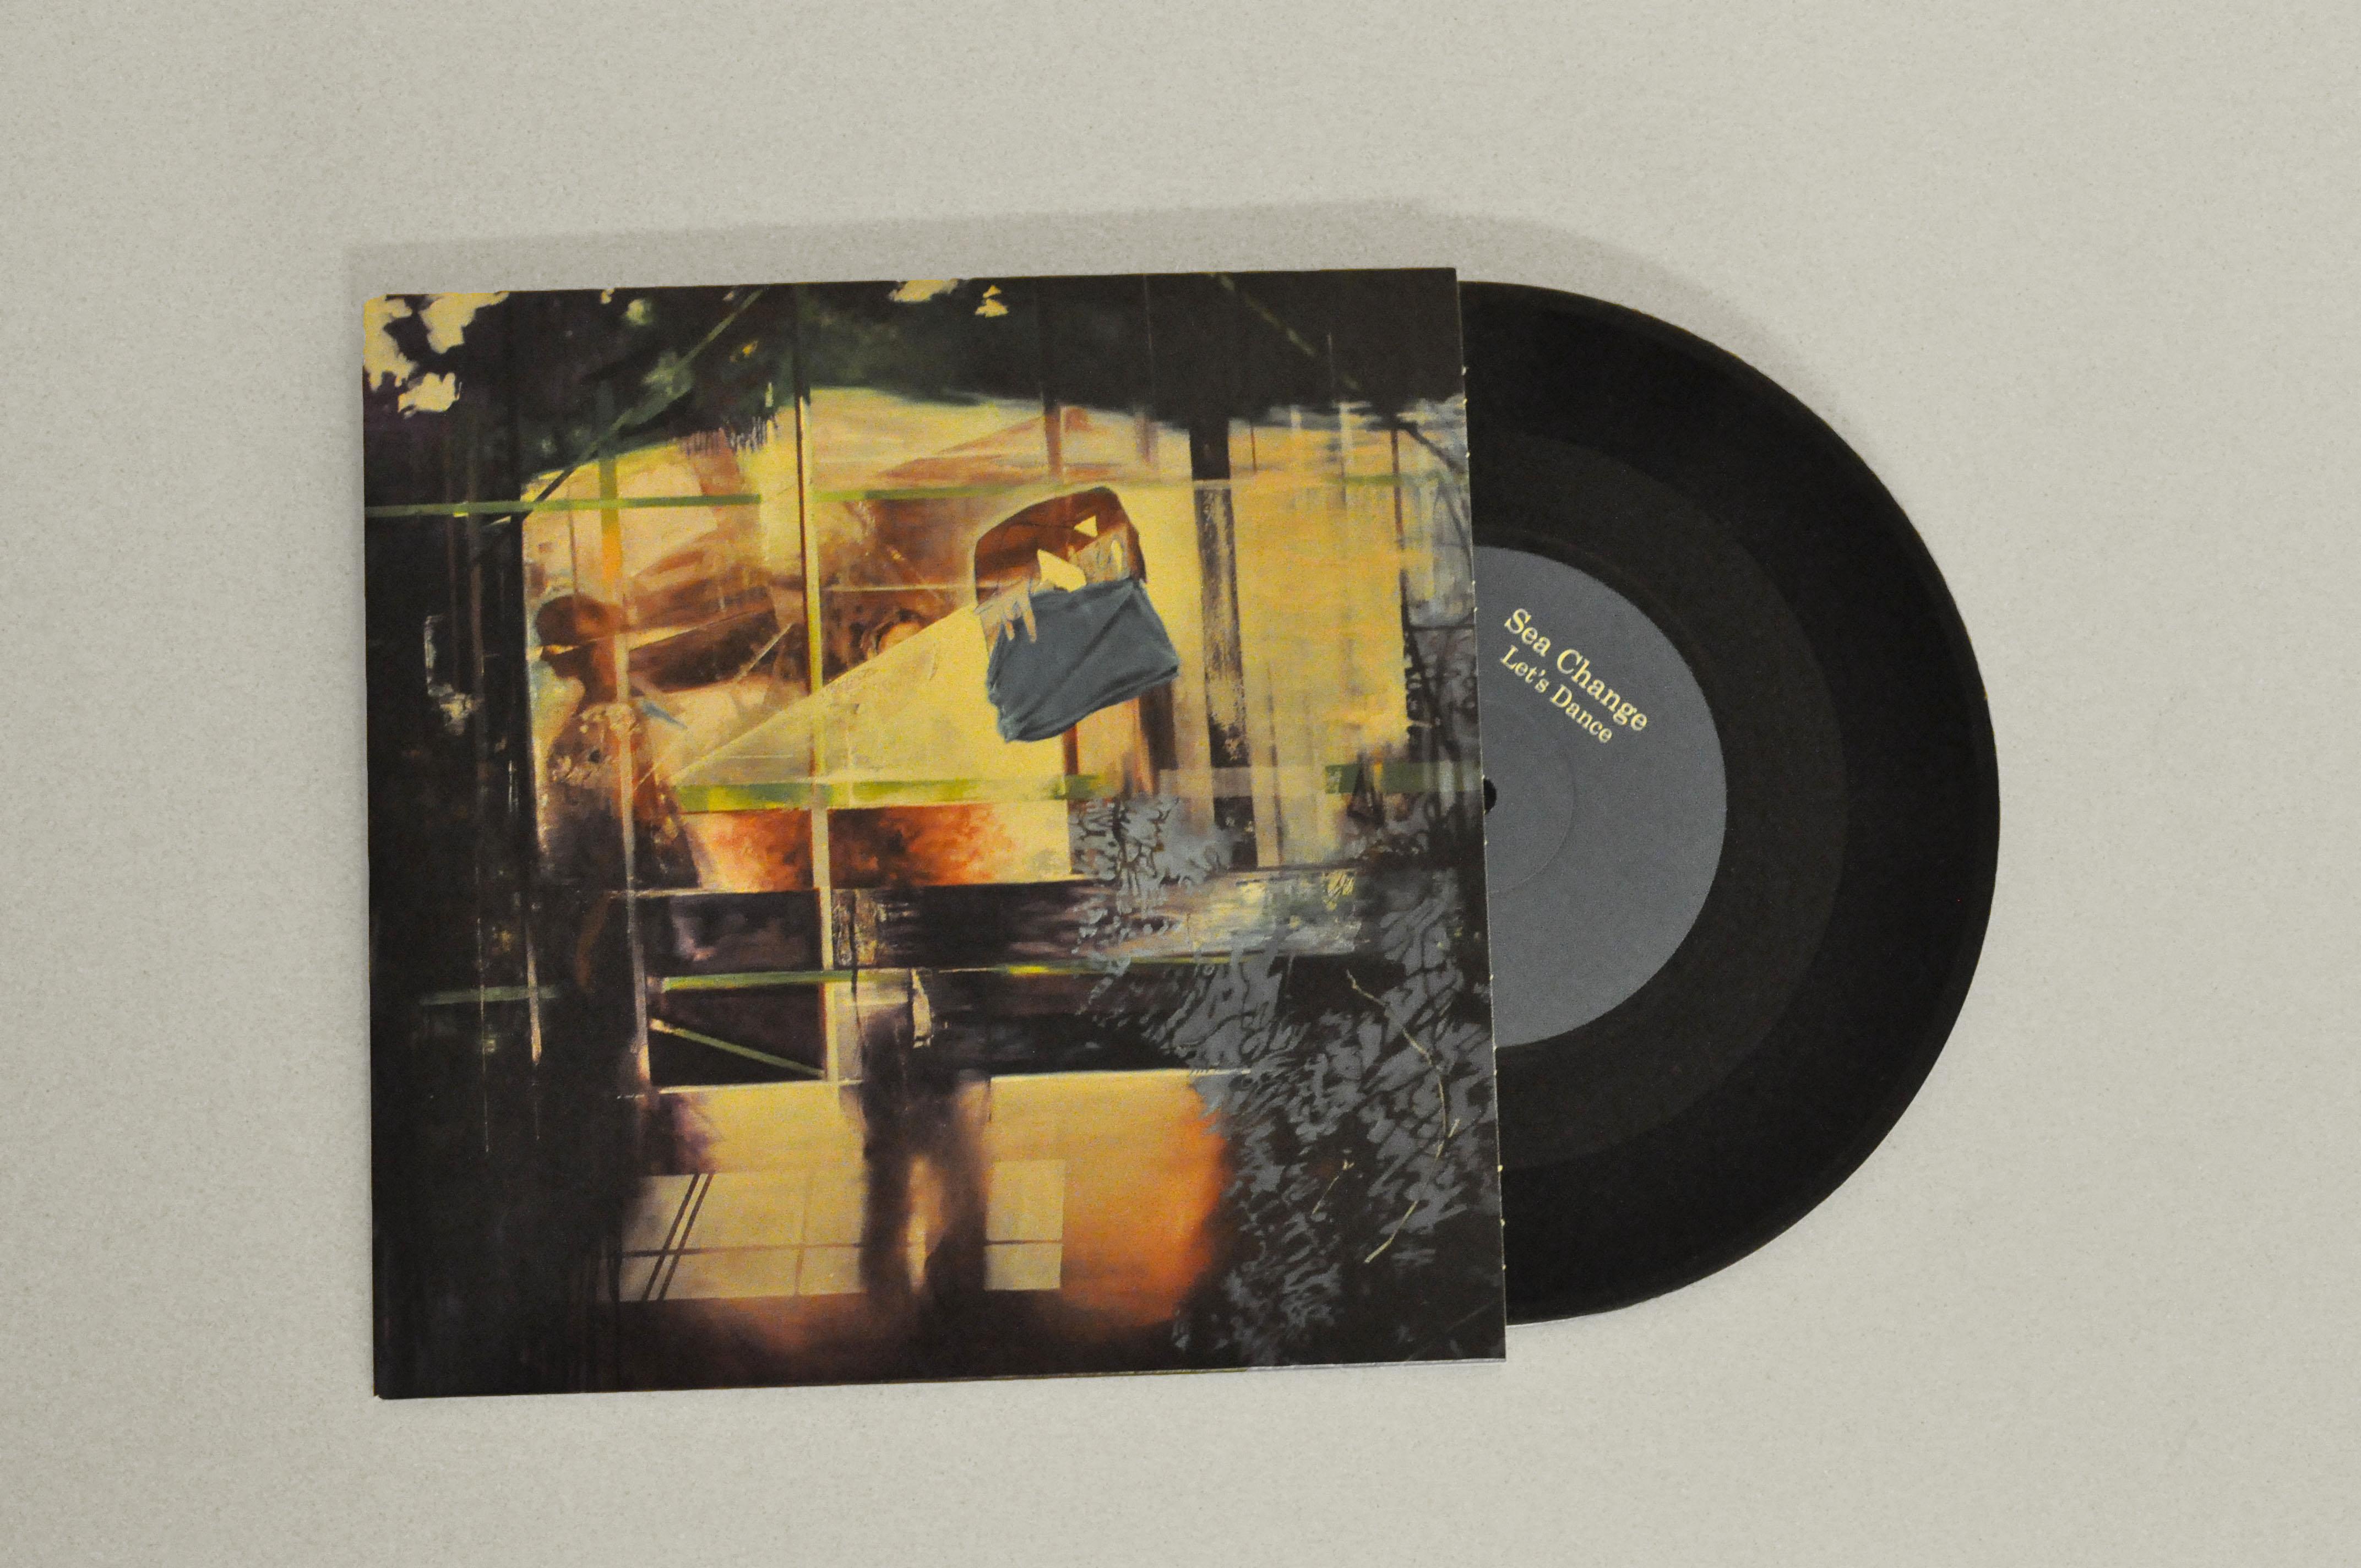 "Sea Change - Let's Dance 7"" single - Shapes Recordings"